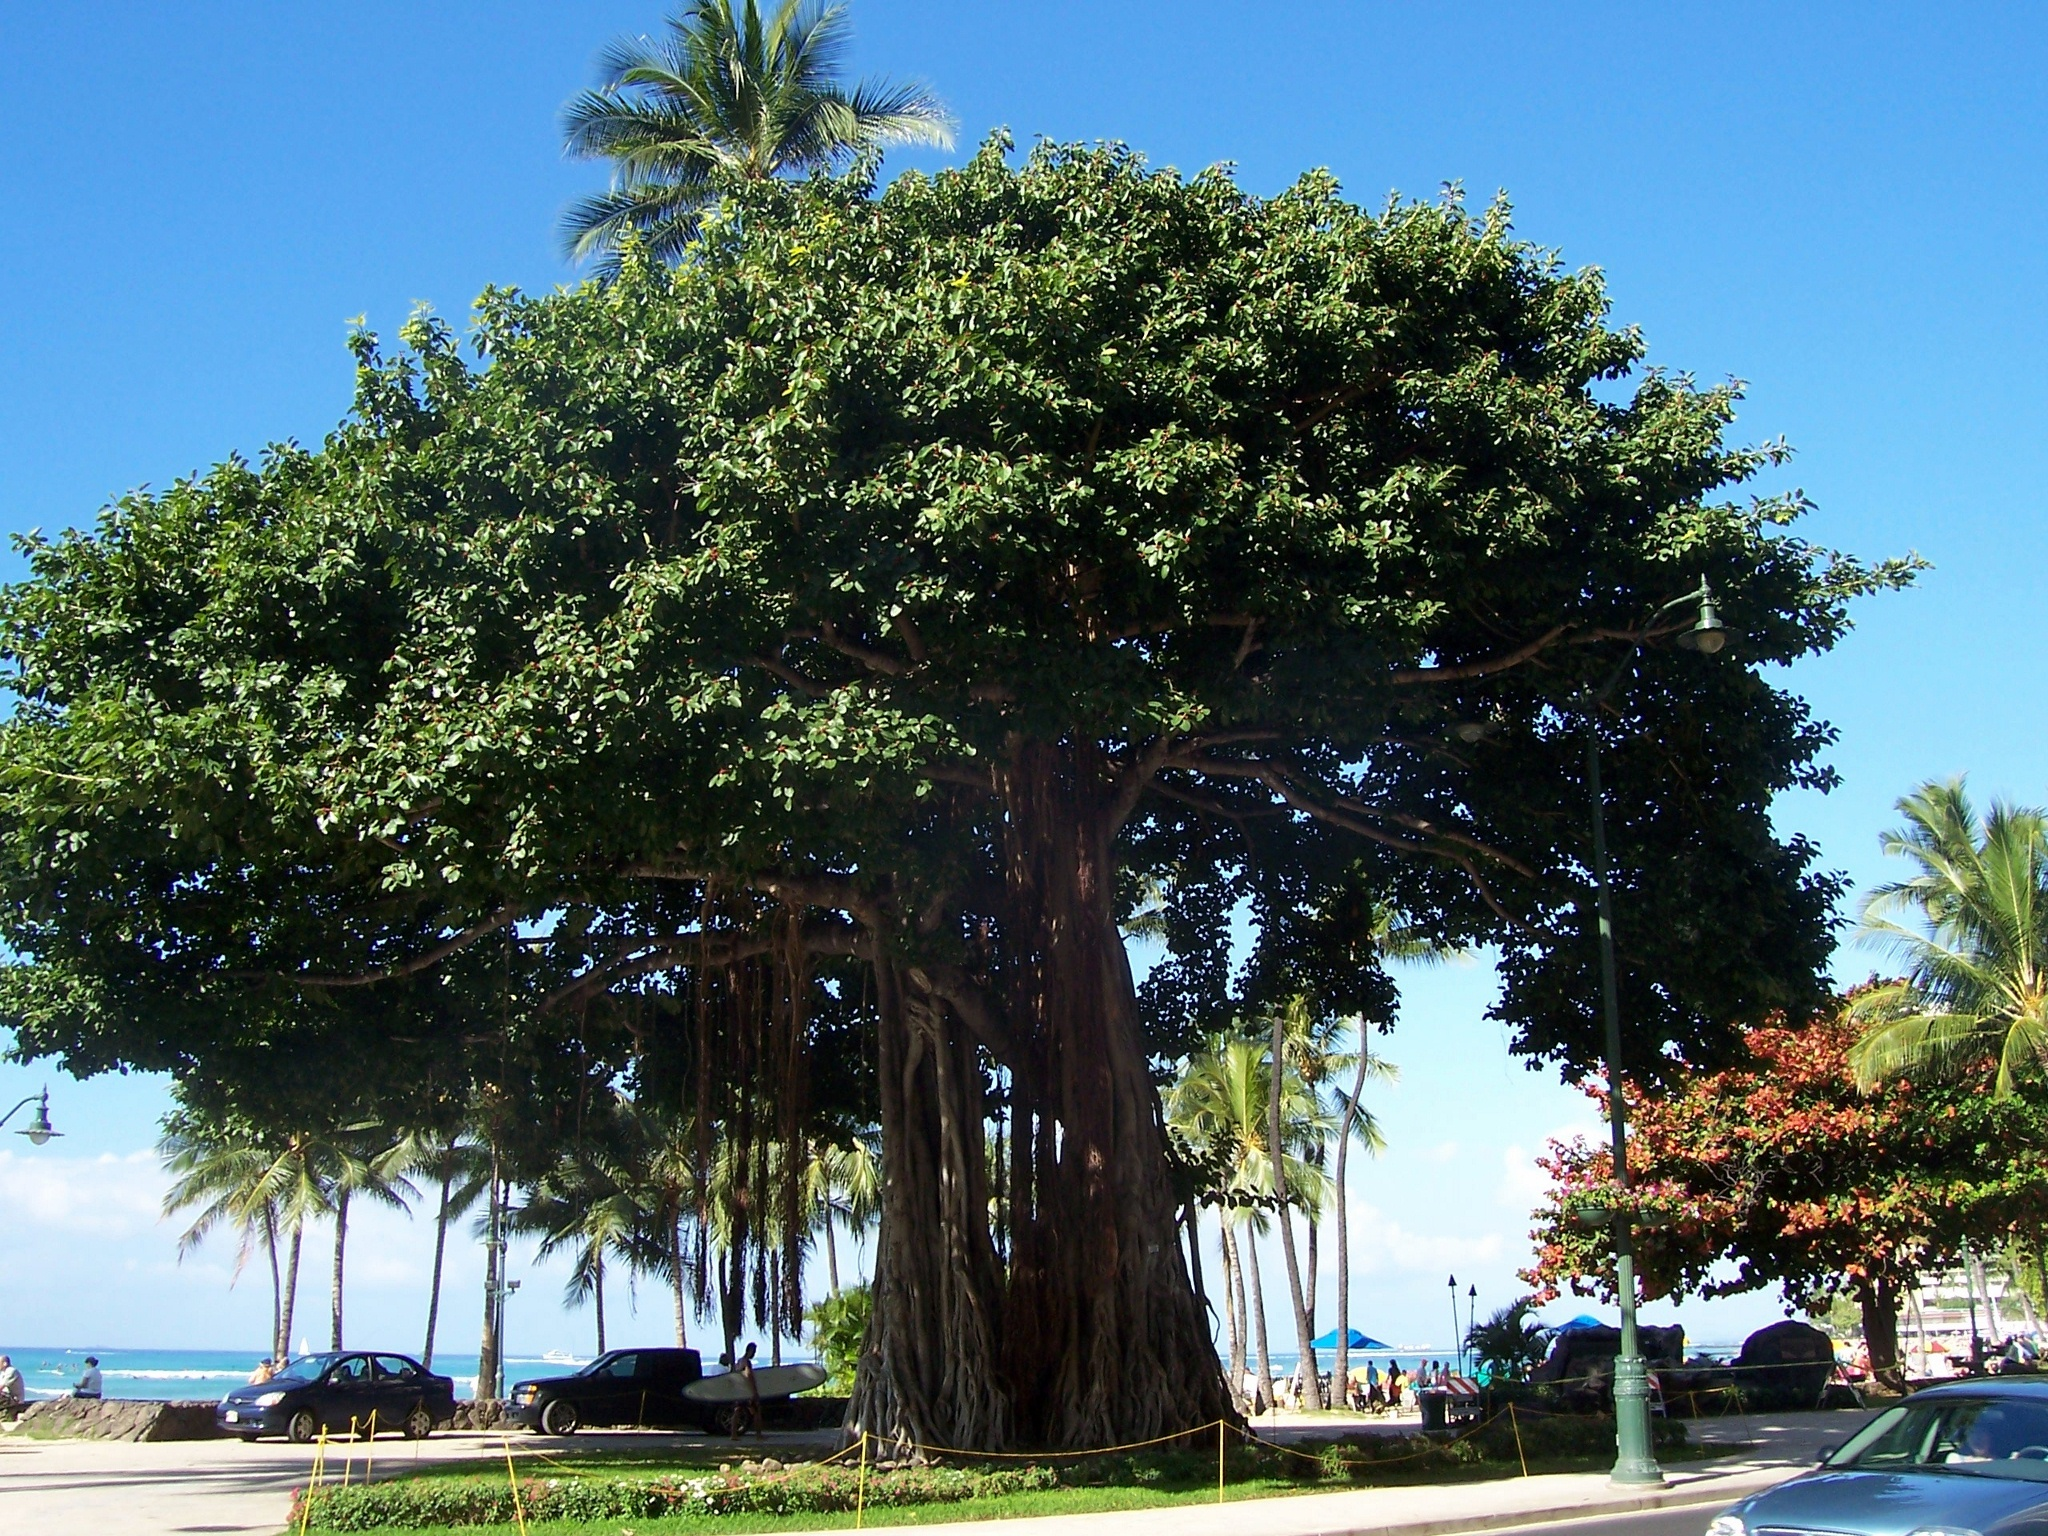 I Love Banyan Trees